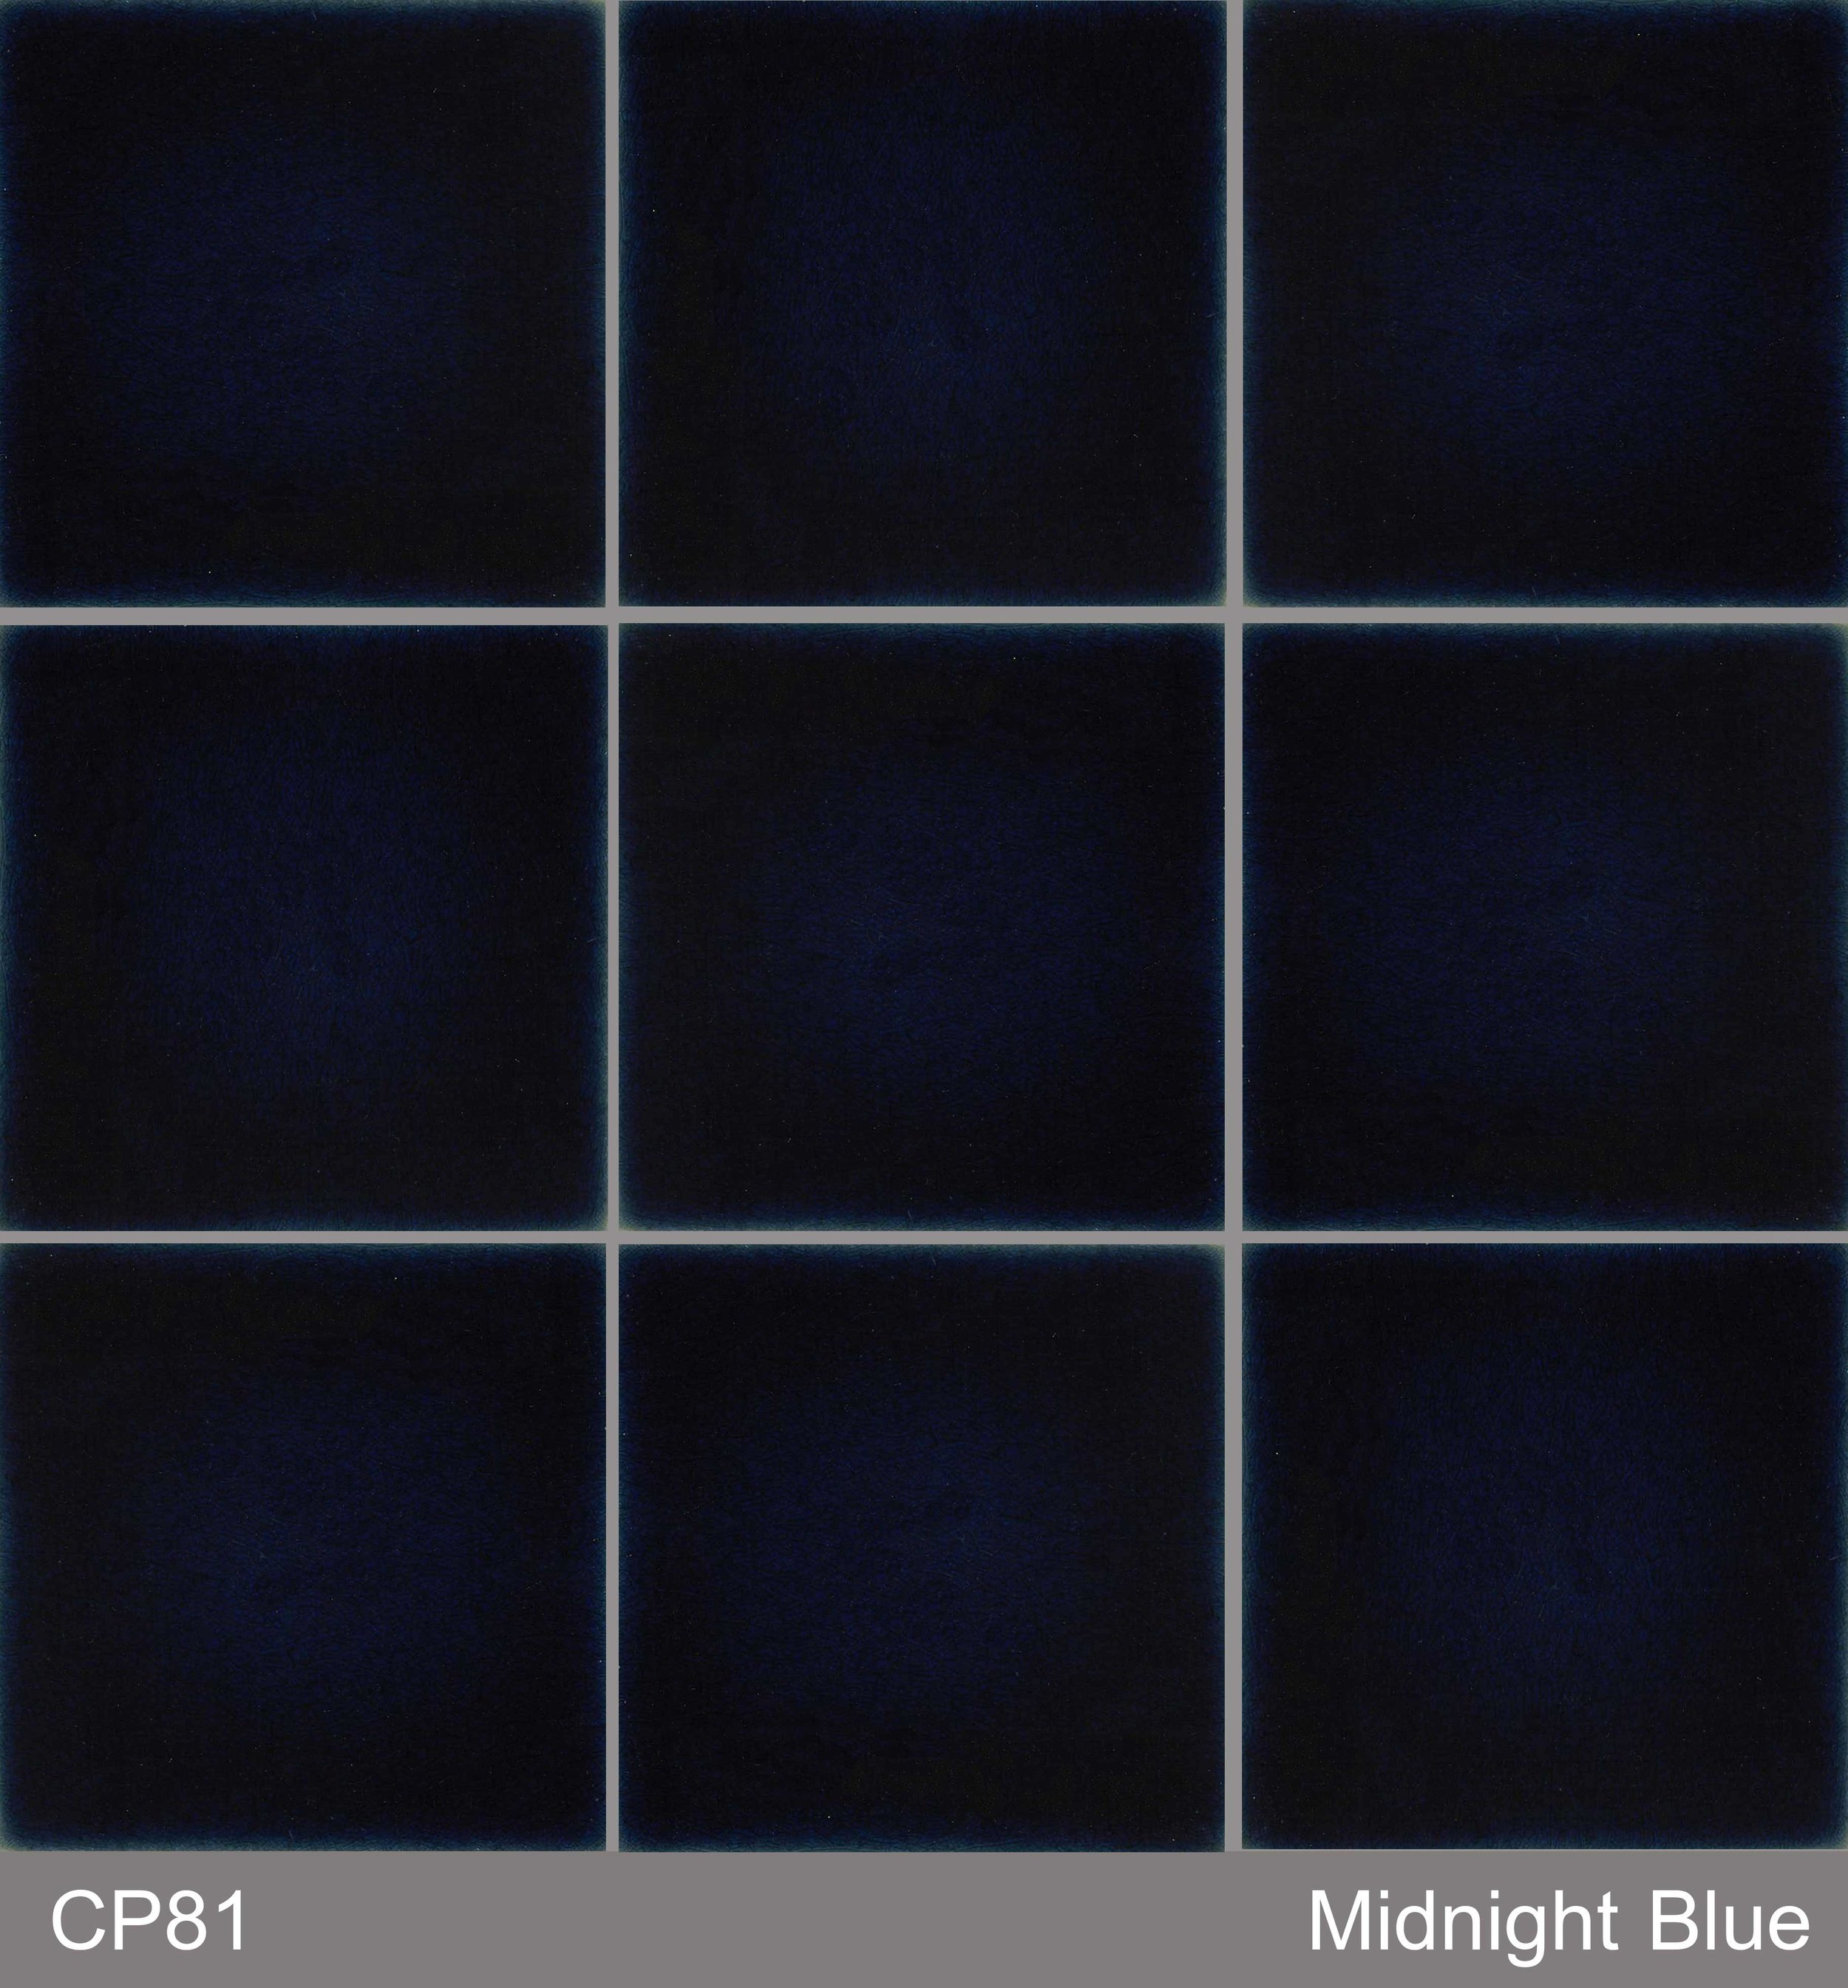 CP81 : Midnight blue